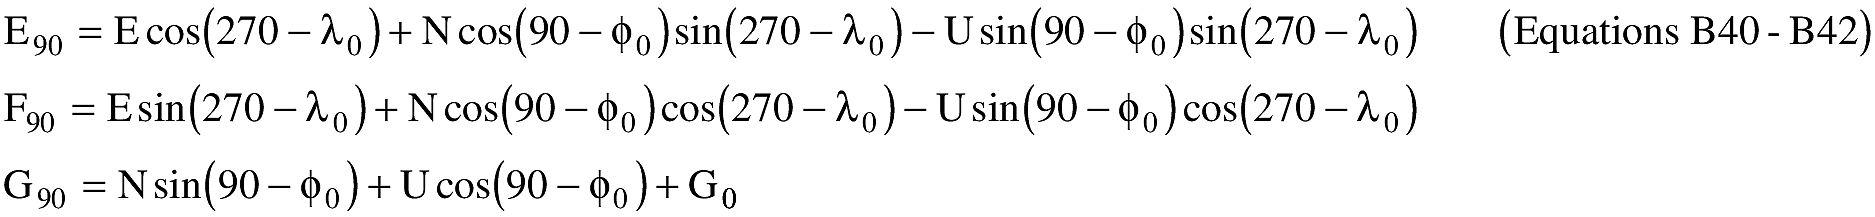 Graphic of (E) An applicant shall transform E,N,U to E90,F90,G90